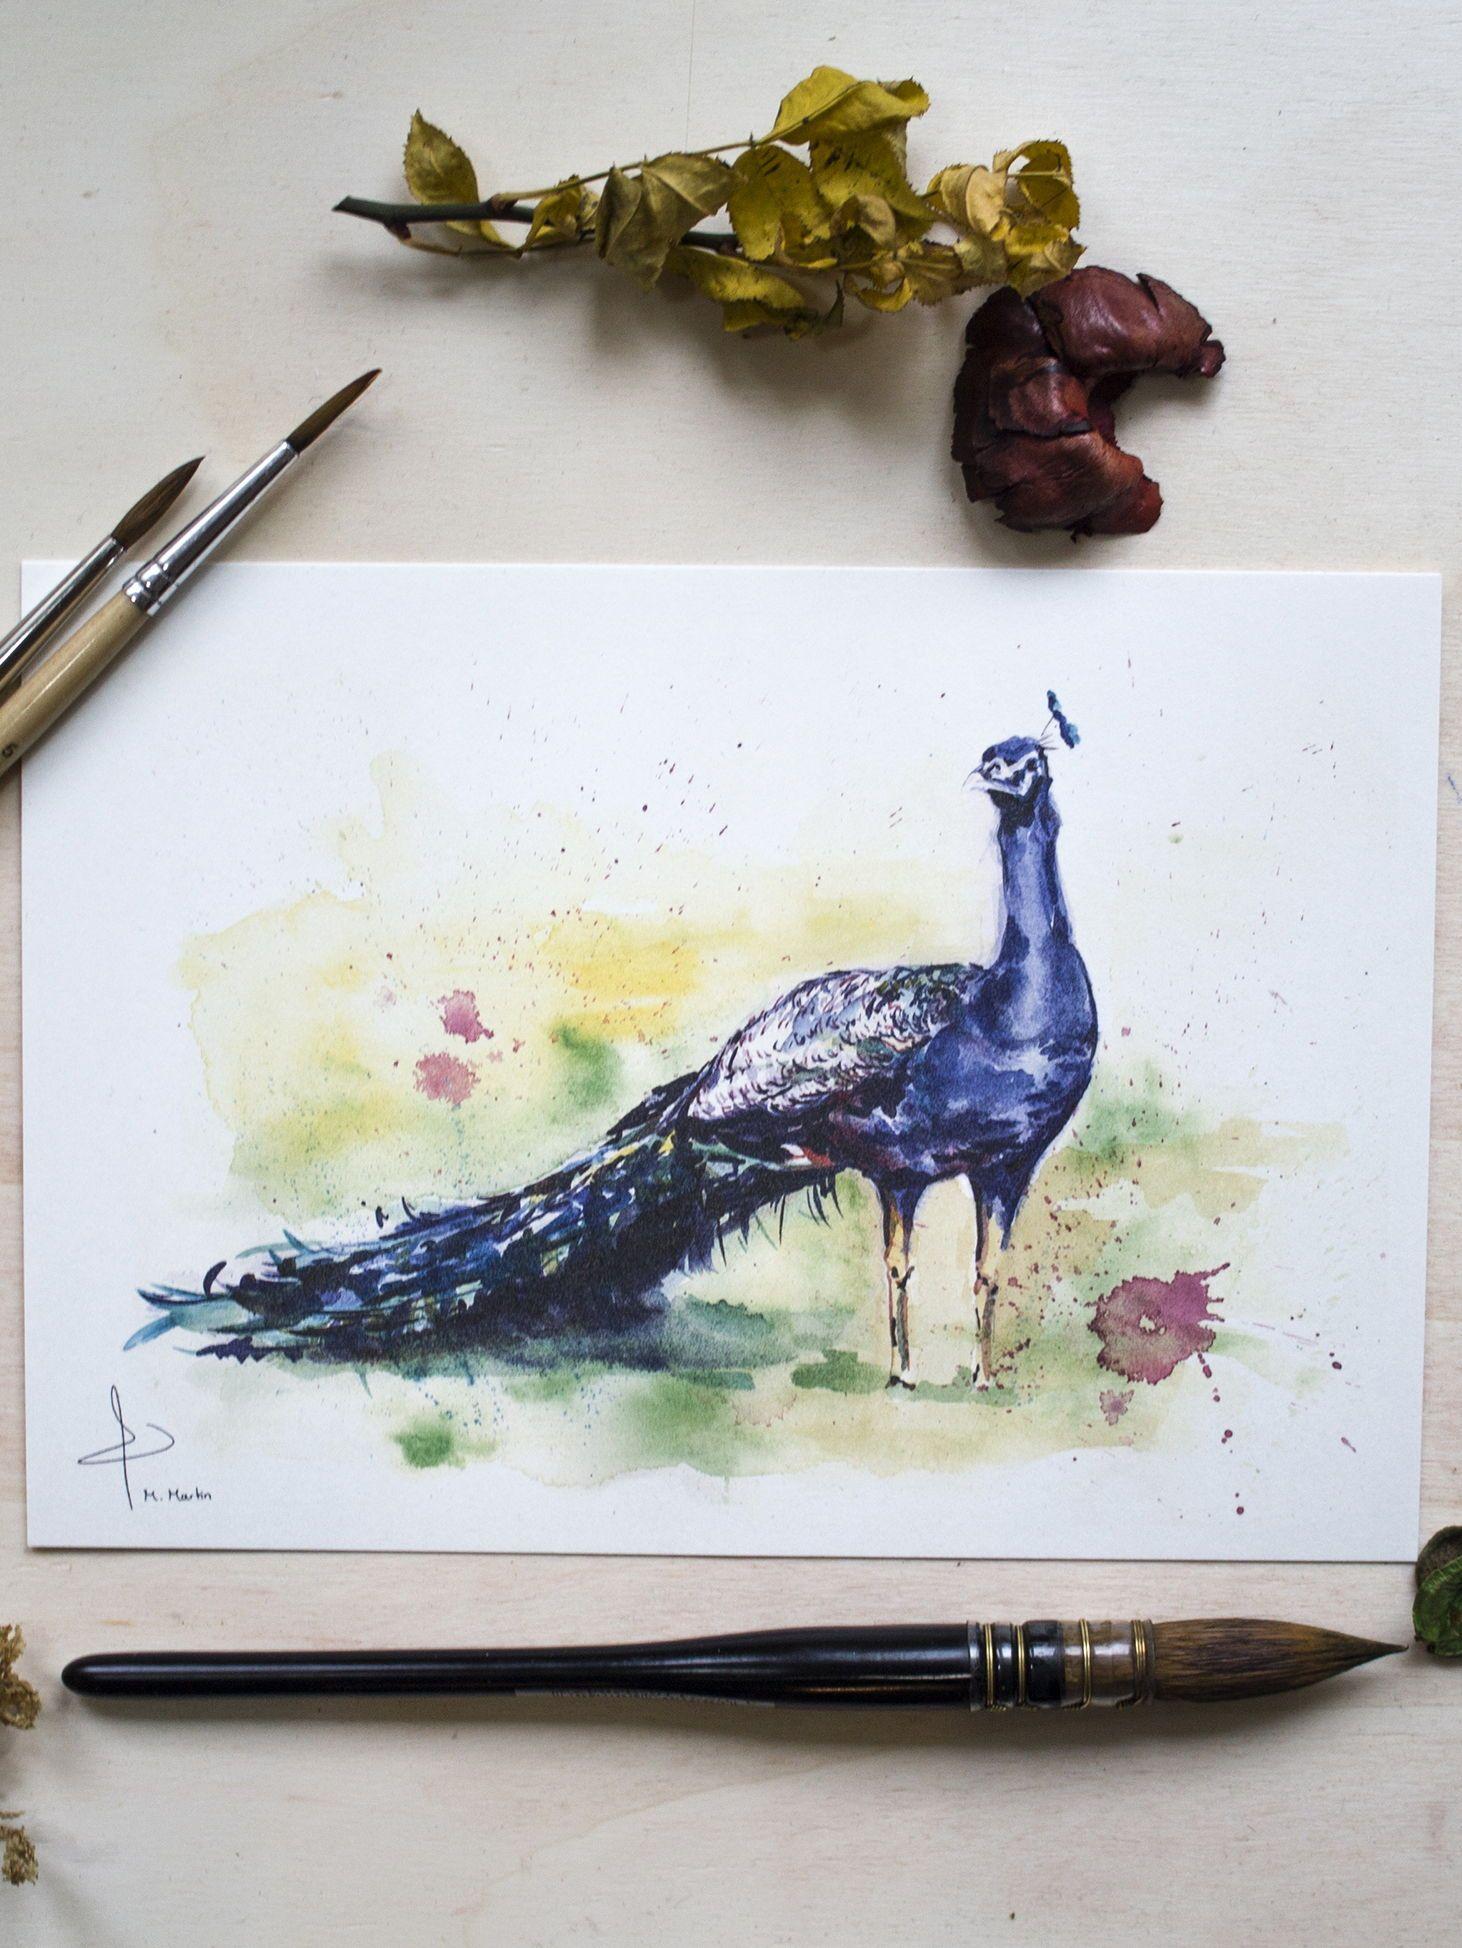 A5 Size A4 Peacock Watercolour Animal illustration Art Print A3